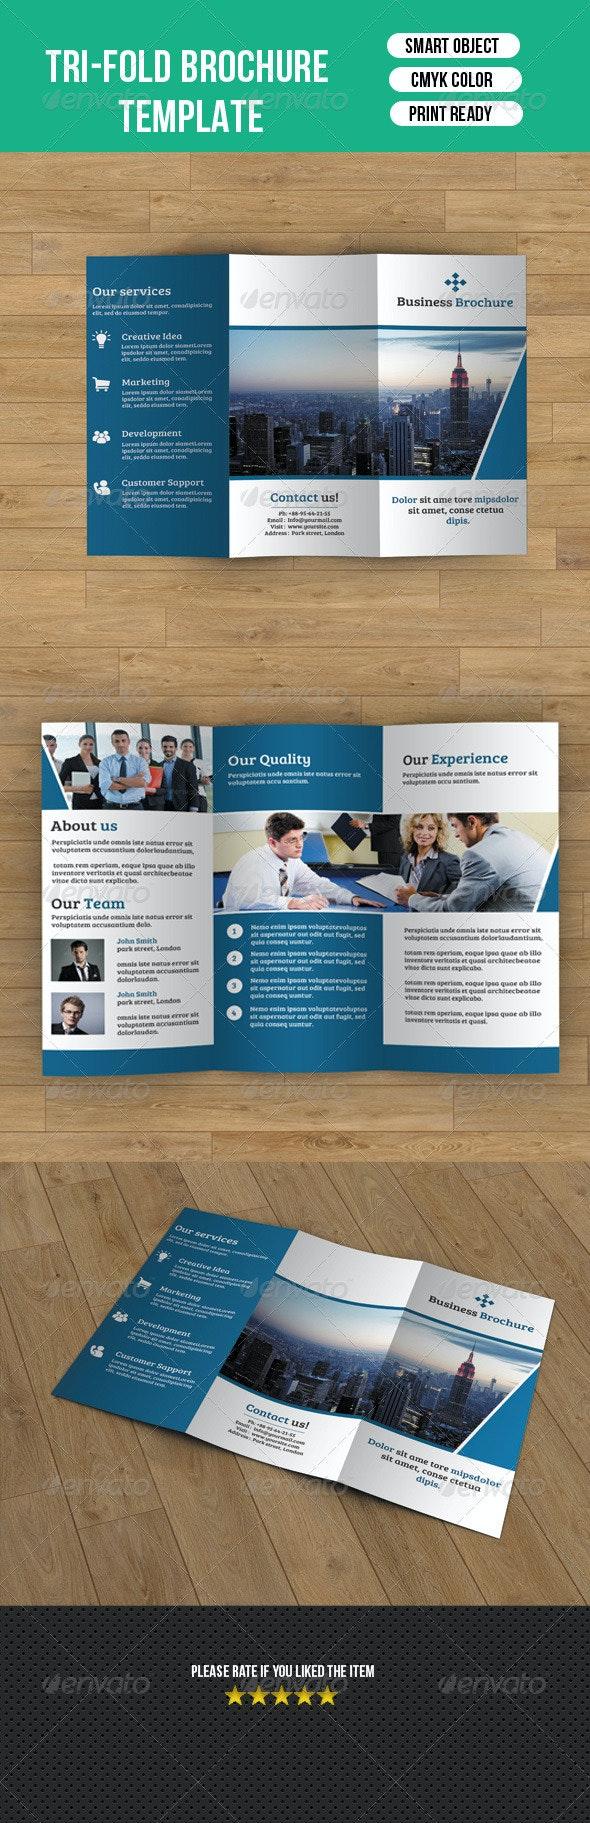 Trifold Business Brochure-V40 - Corporate Brochures